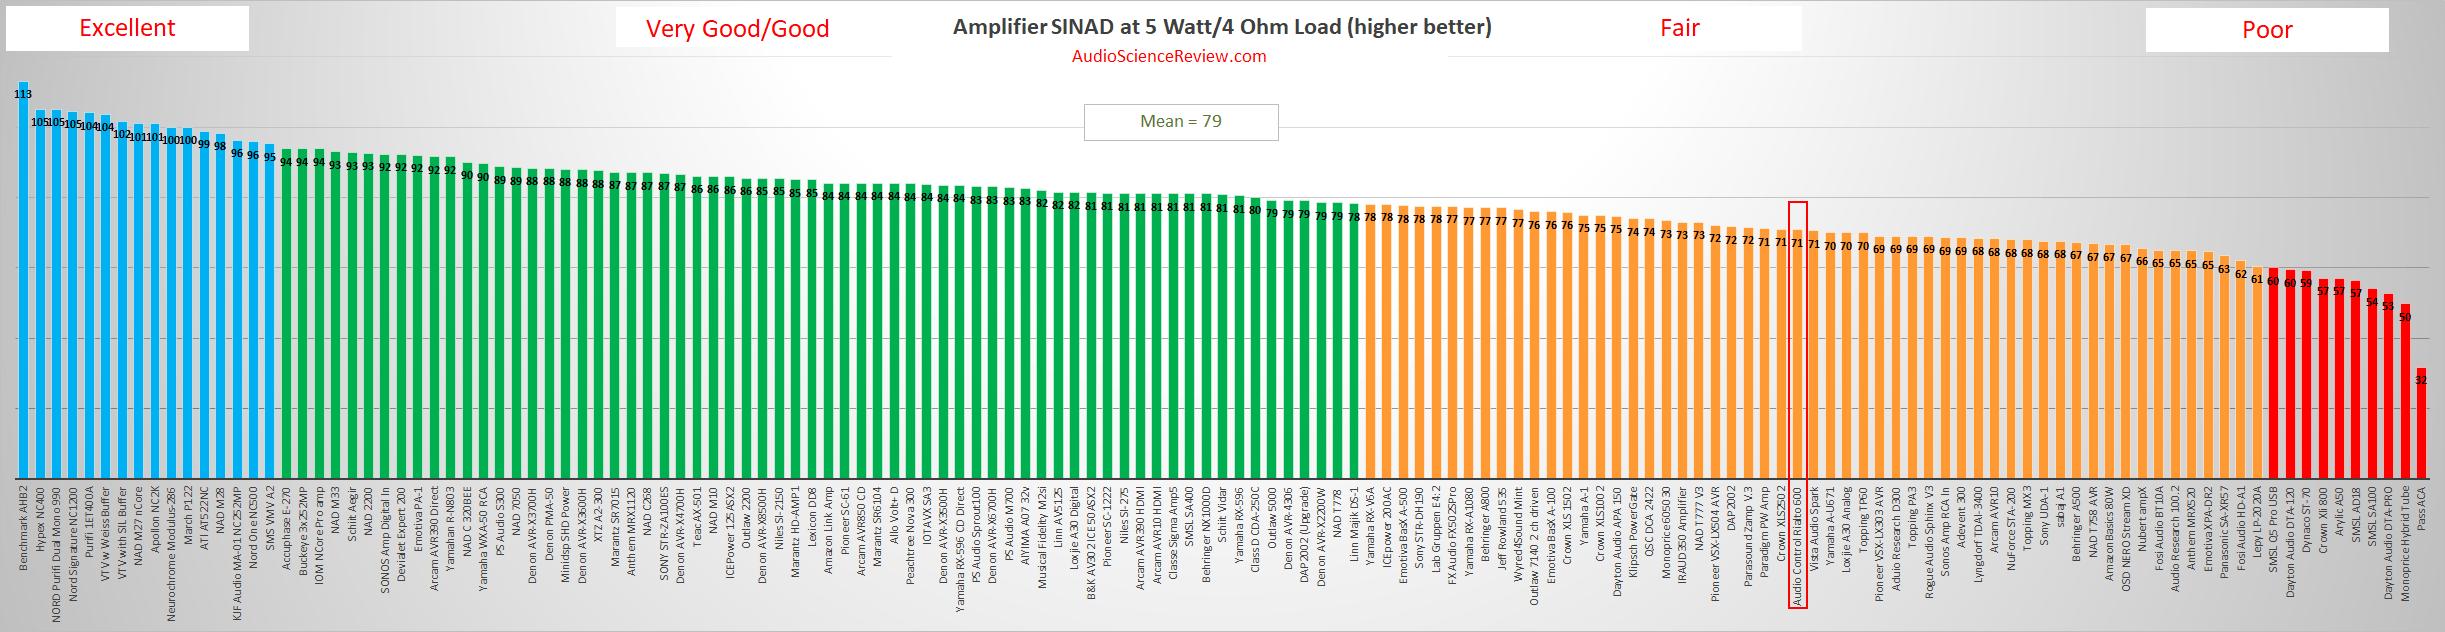 Best CI amplifier reviewed 2021.png